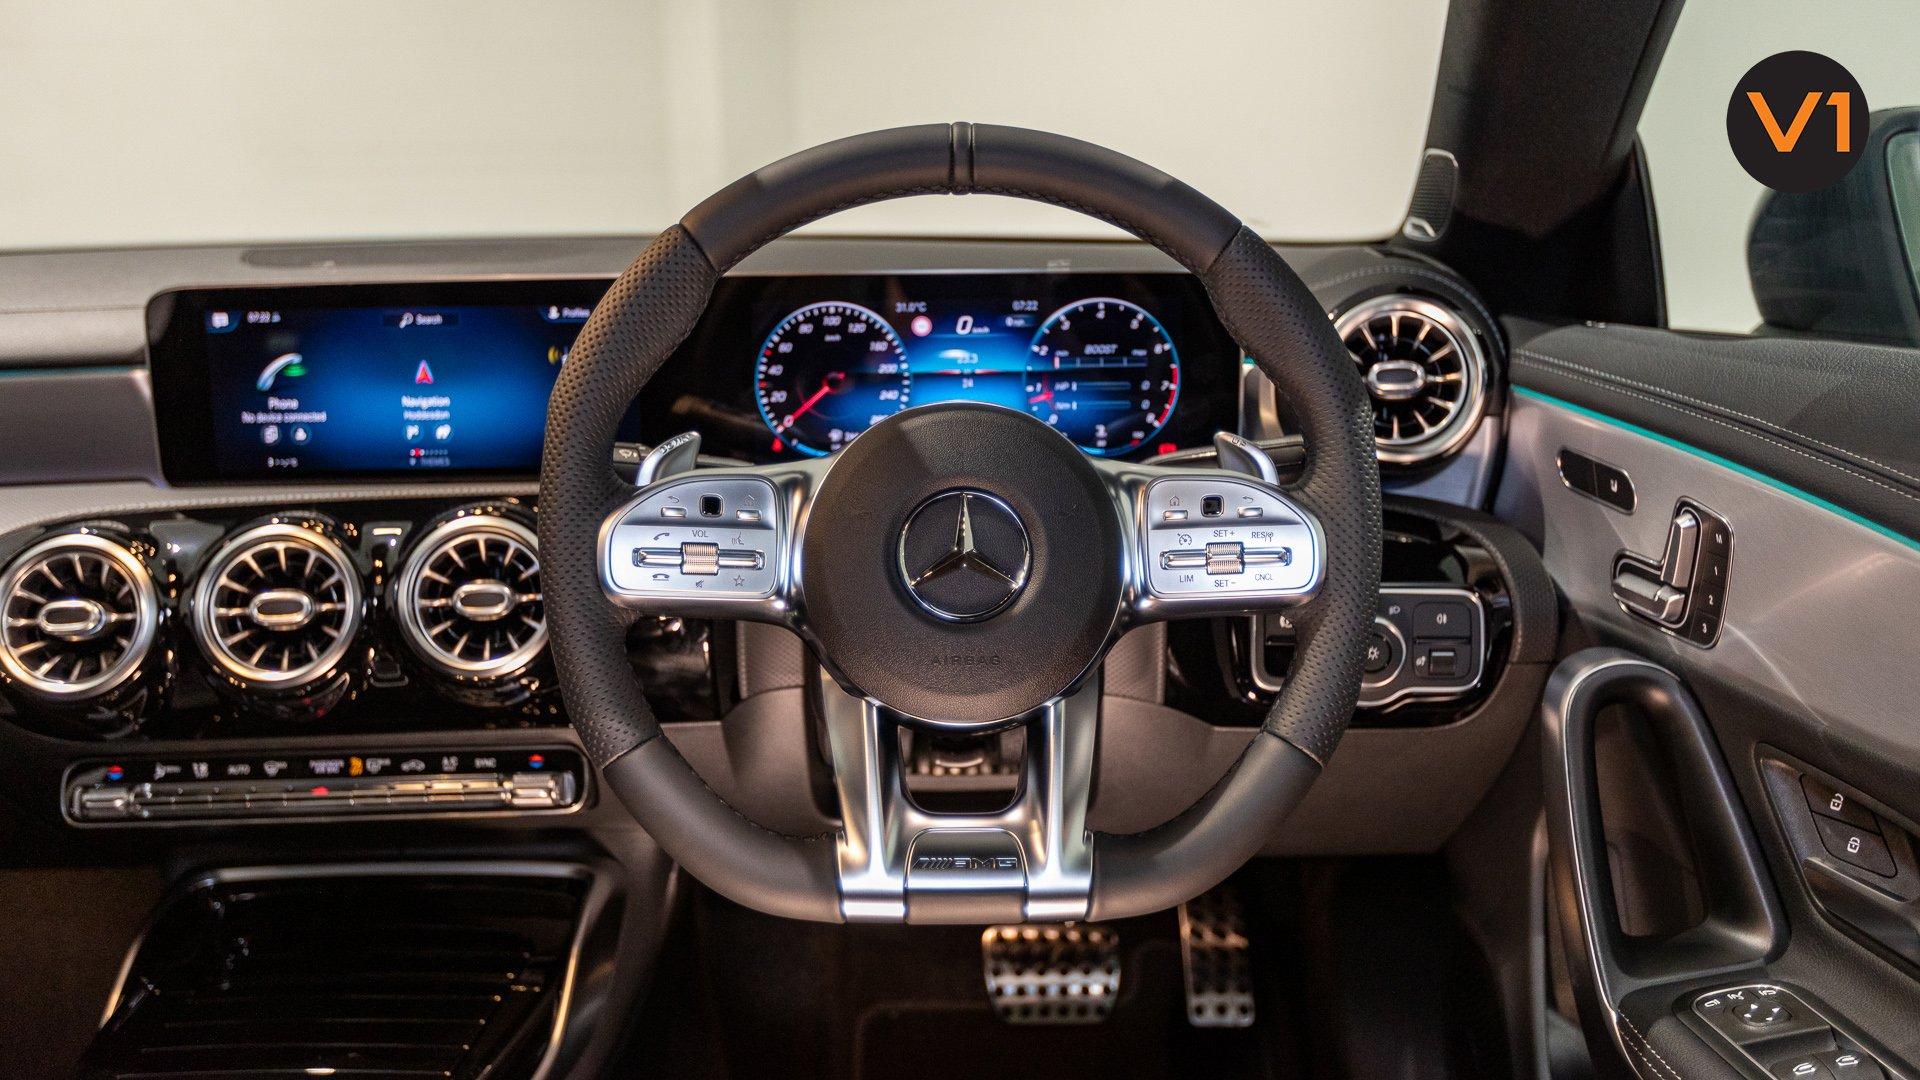 Mercedes-AMG CLA35 Coupe AMG 4Matic Premium Plus - Steering Wheel